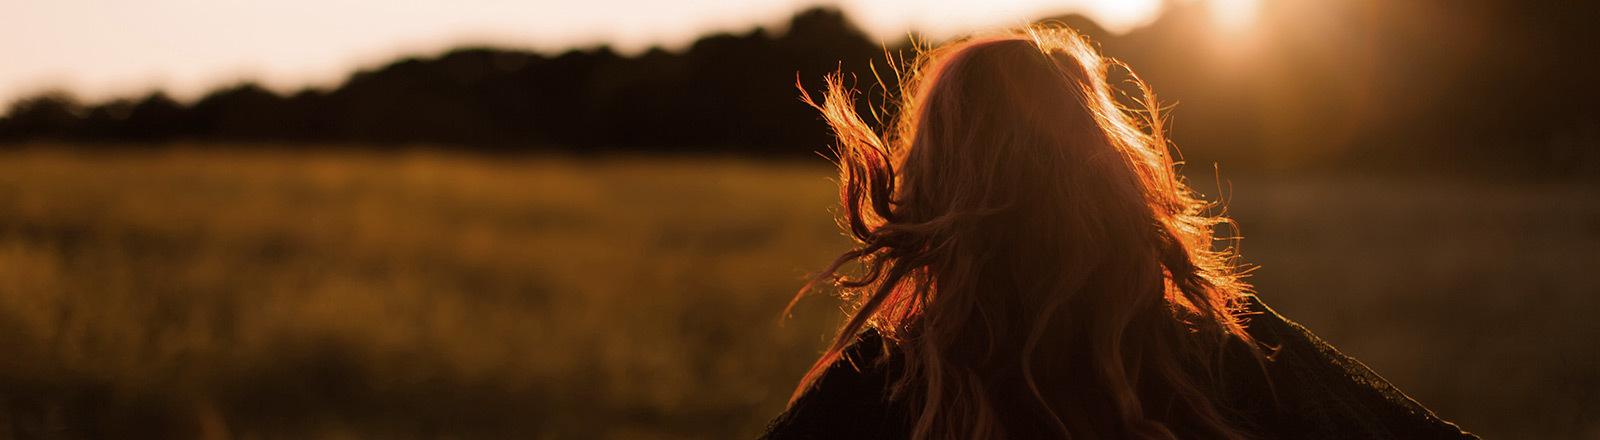 Frau auf einem Feld